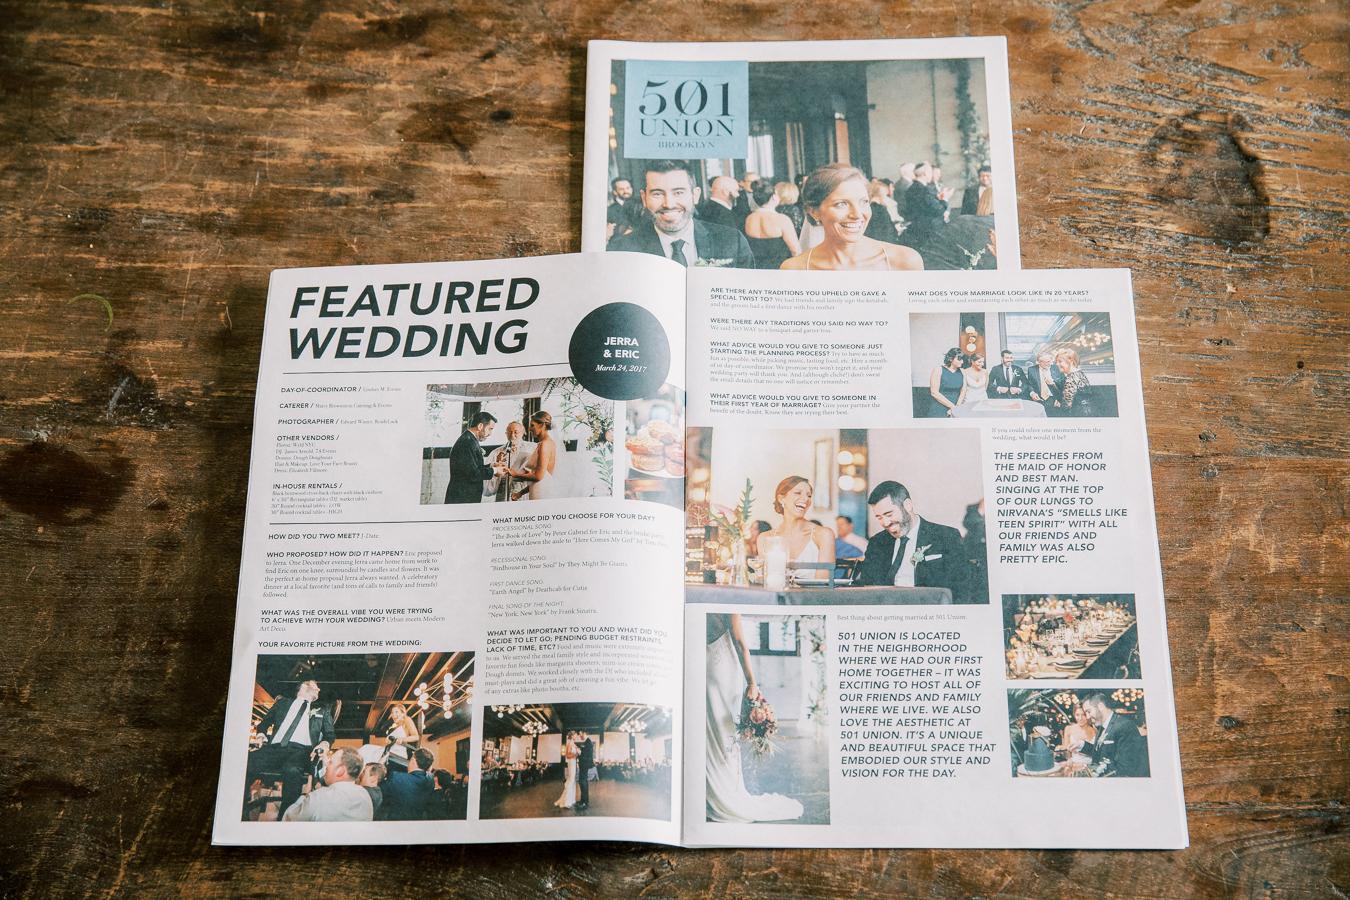 Edward Winter, 501 Union Feature Brooklyn Wedding Photographer